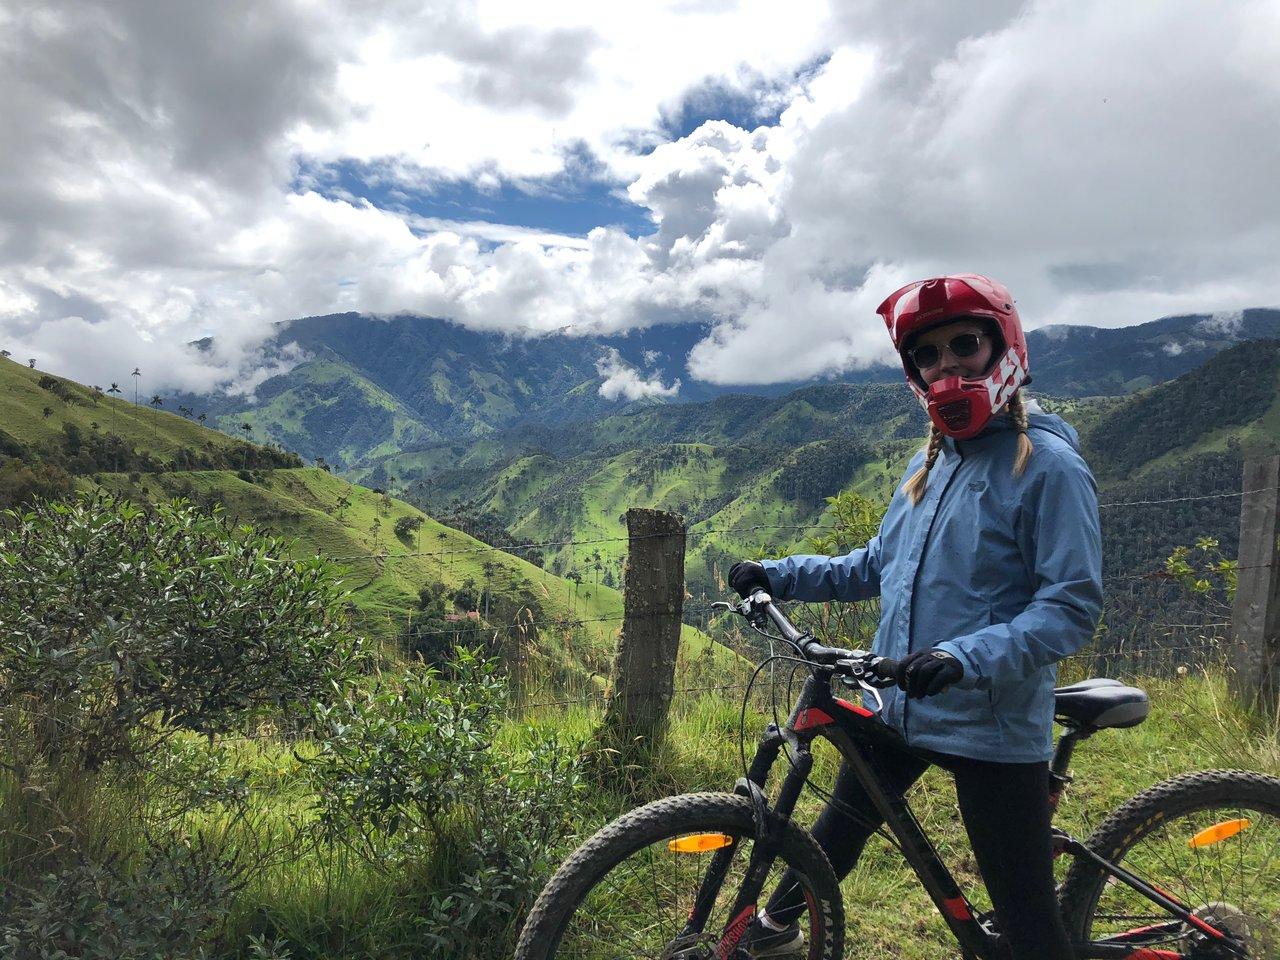 Wax Palms, Salento Cycling | Photo taken by Rachel B